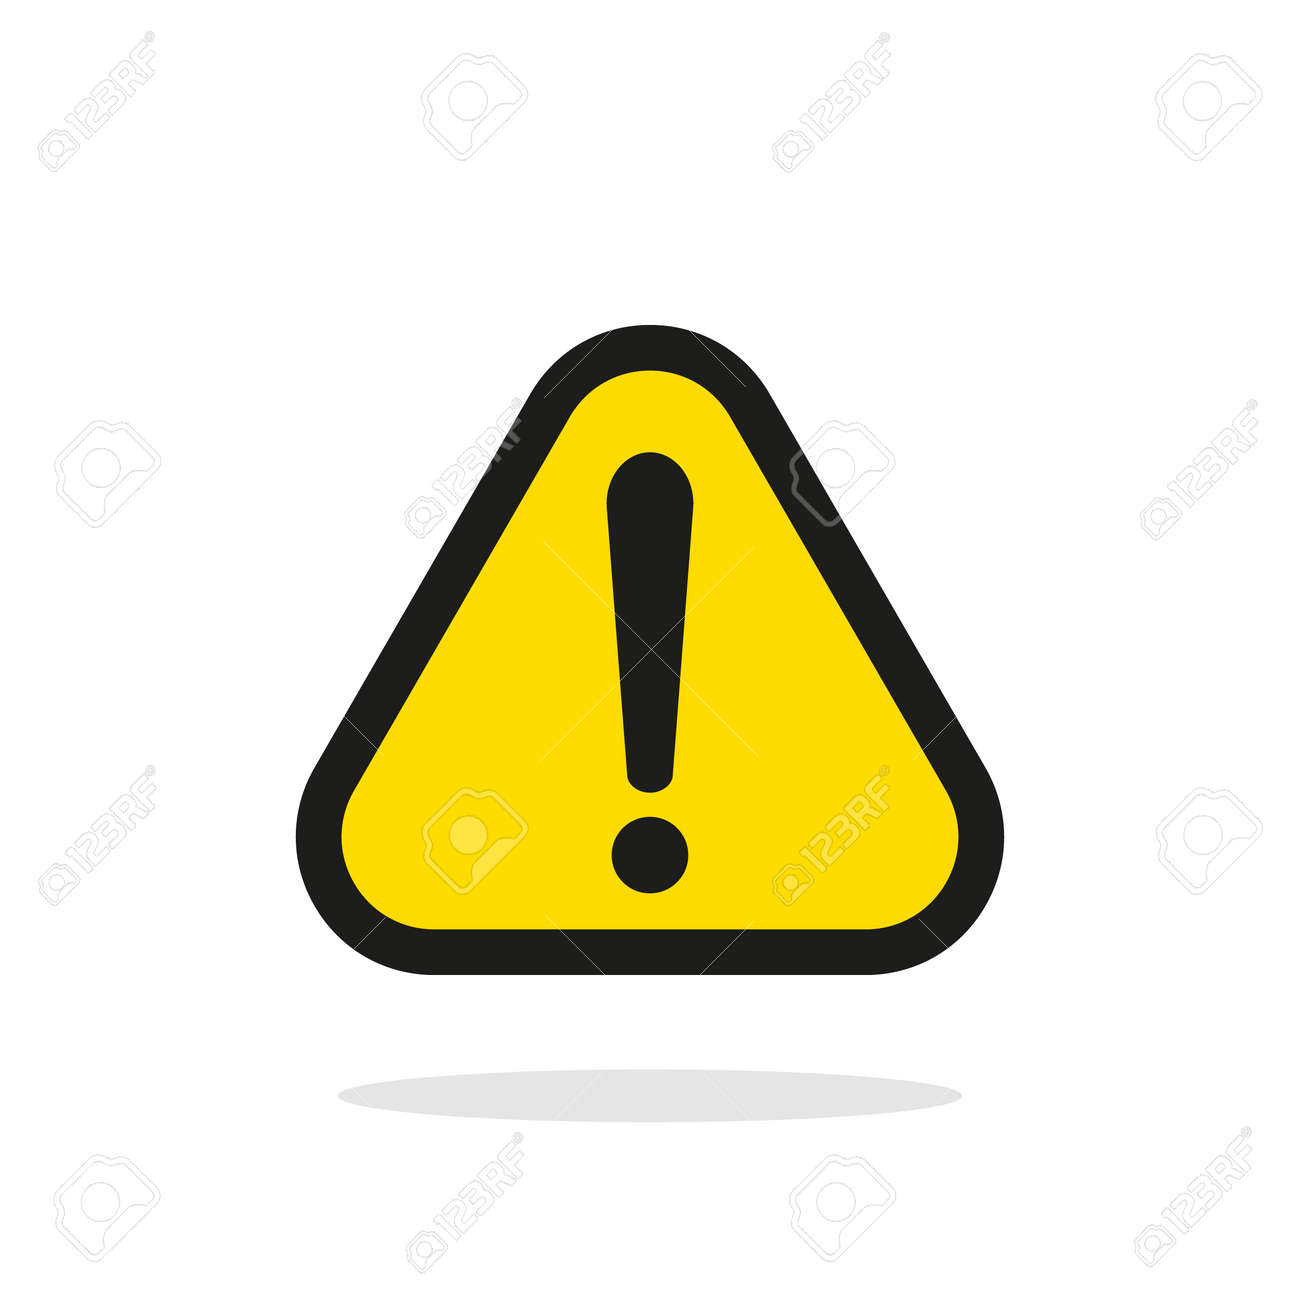 Warning sign, Yellow warning sign, Warning sign Icon, Warning sign on white, Warning sign vector, Warning sign illustration. Triangle warning sign - 57936437